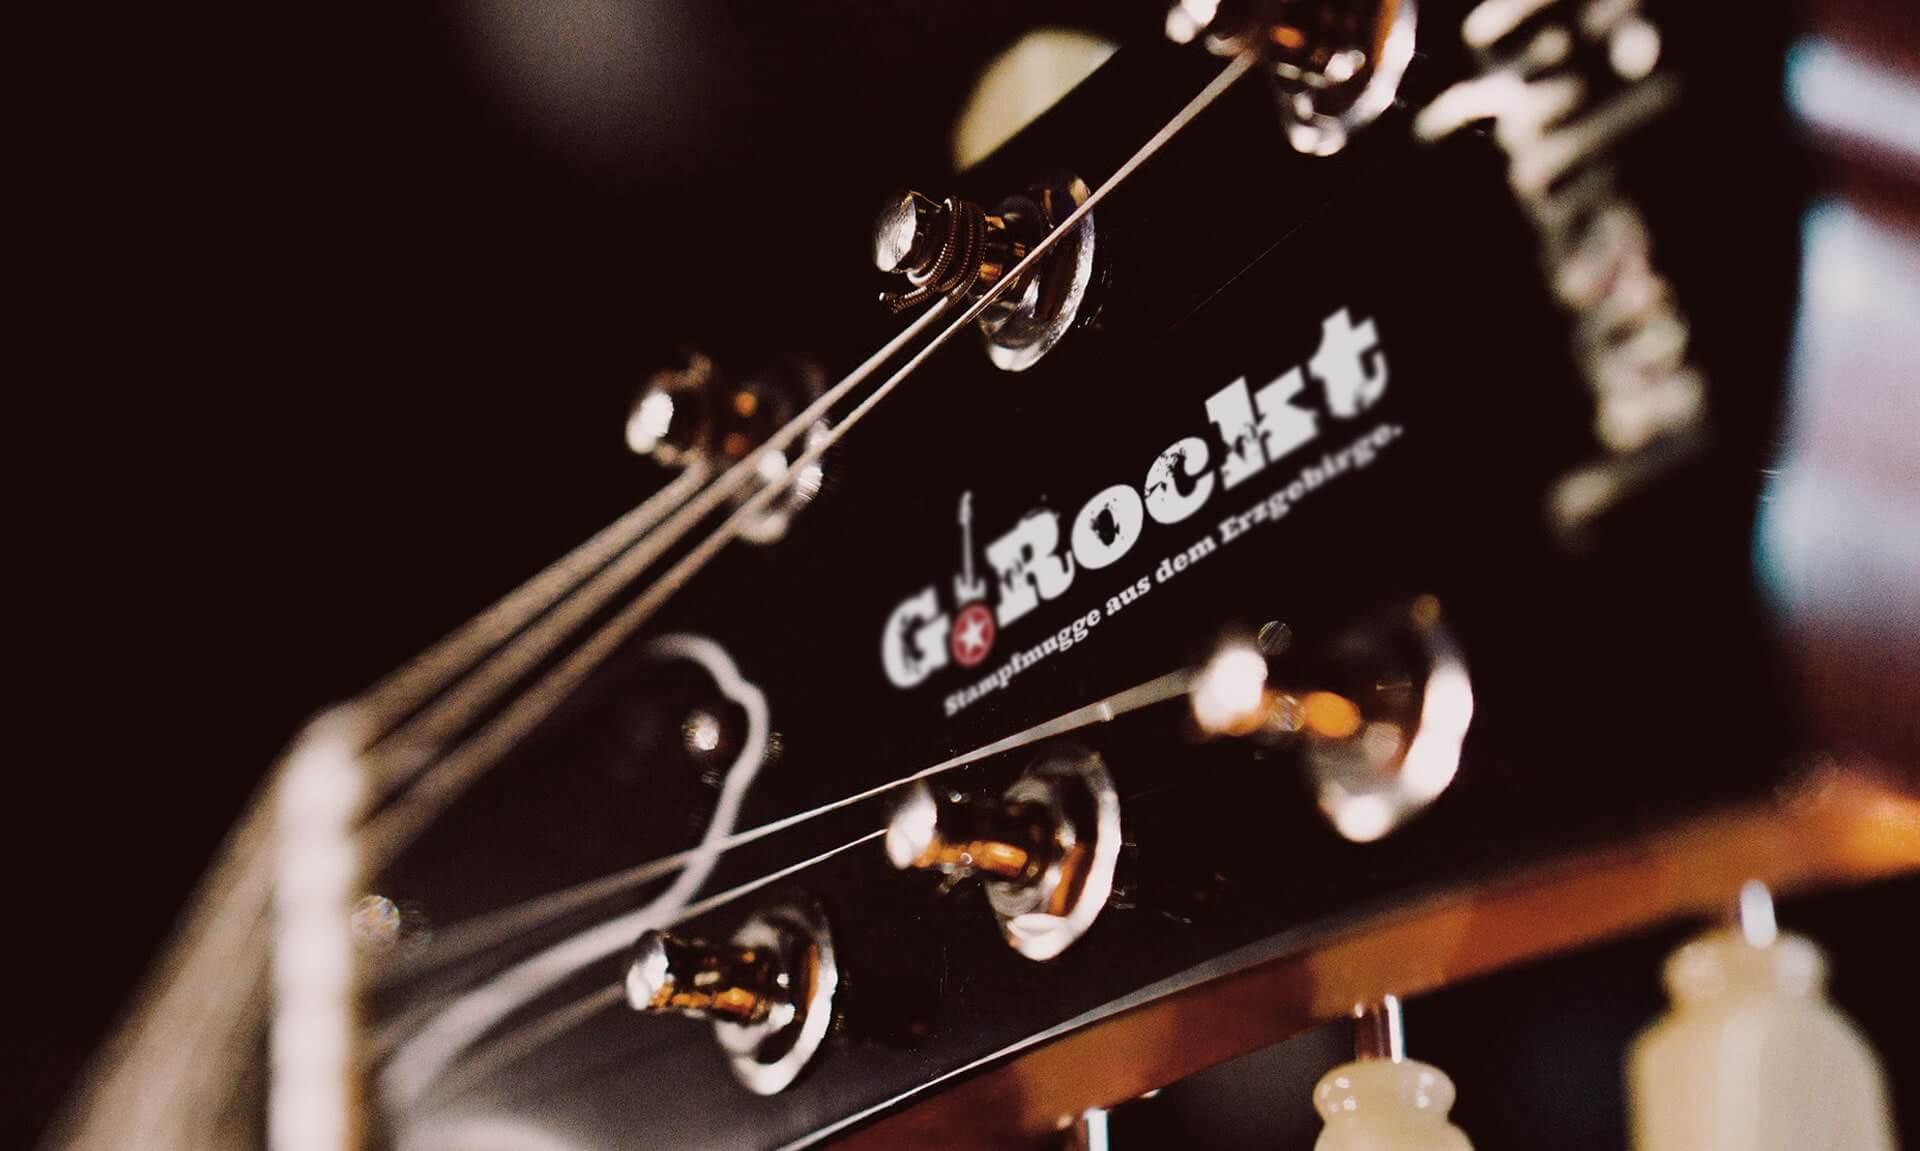 G.Rockt - Referenz Maho Werbeagentur Dresden